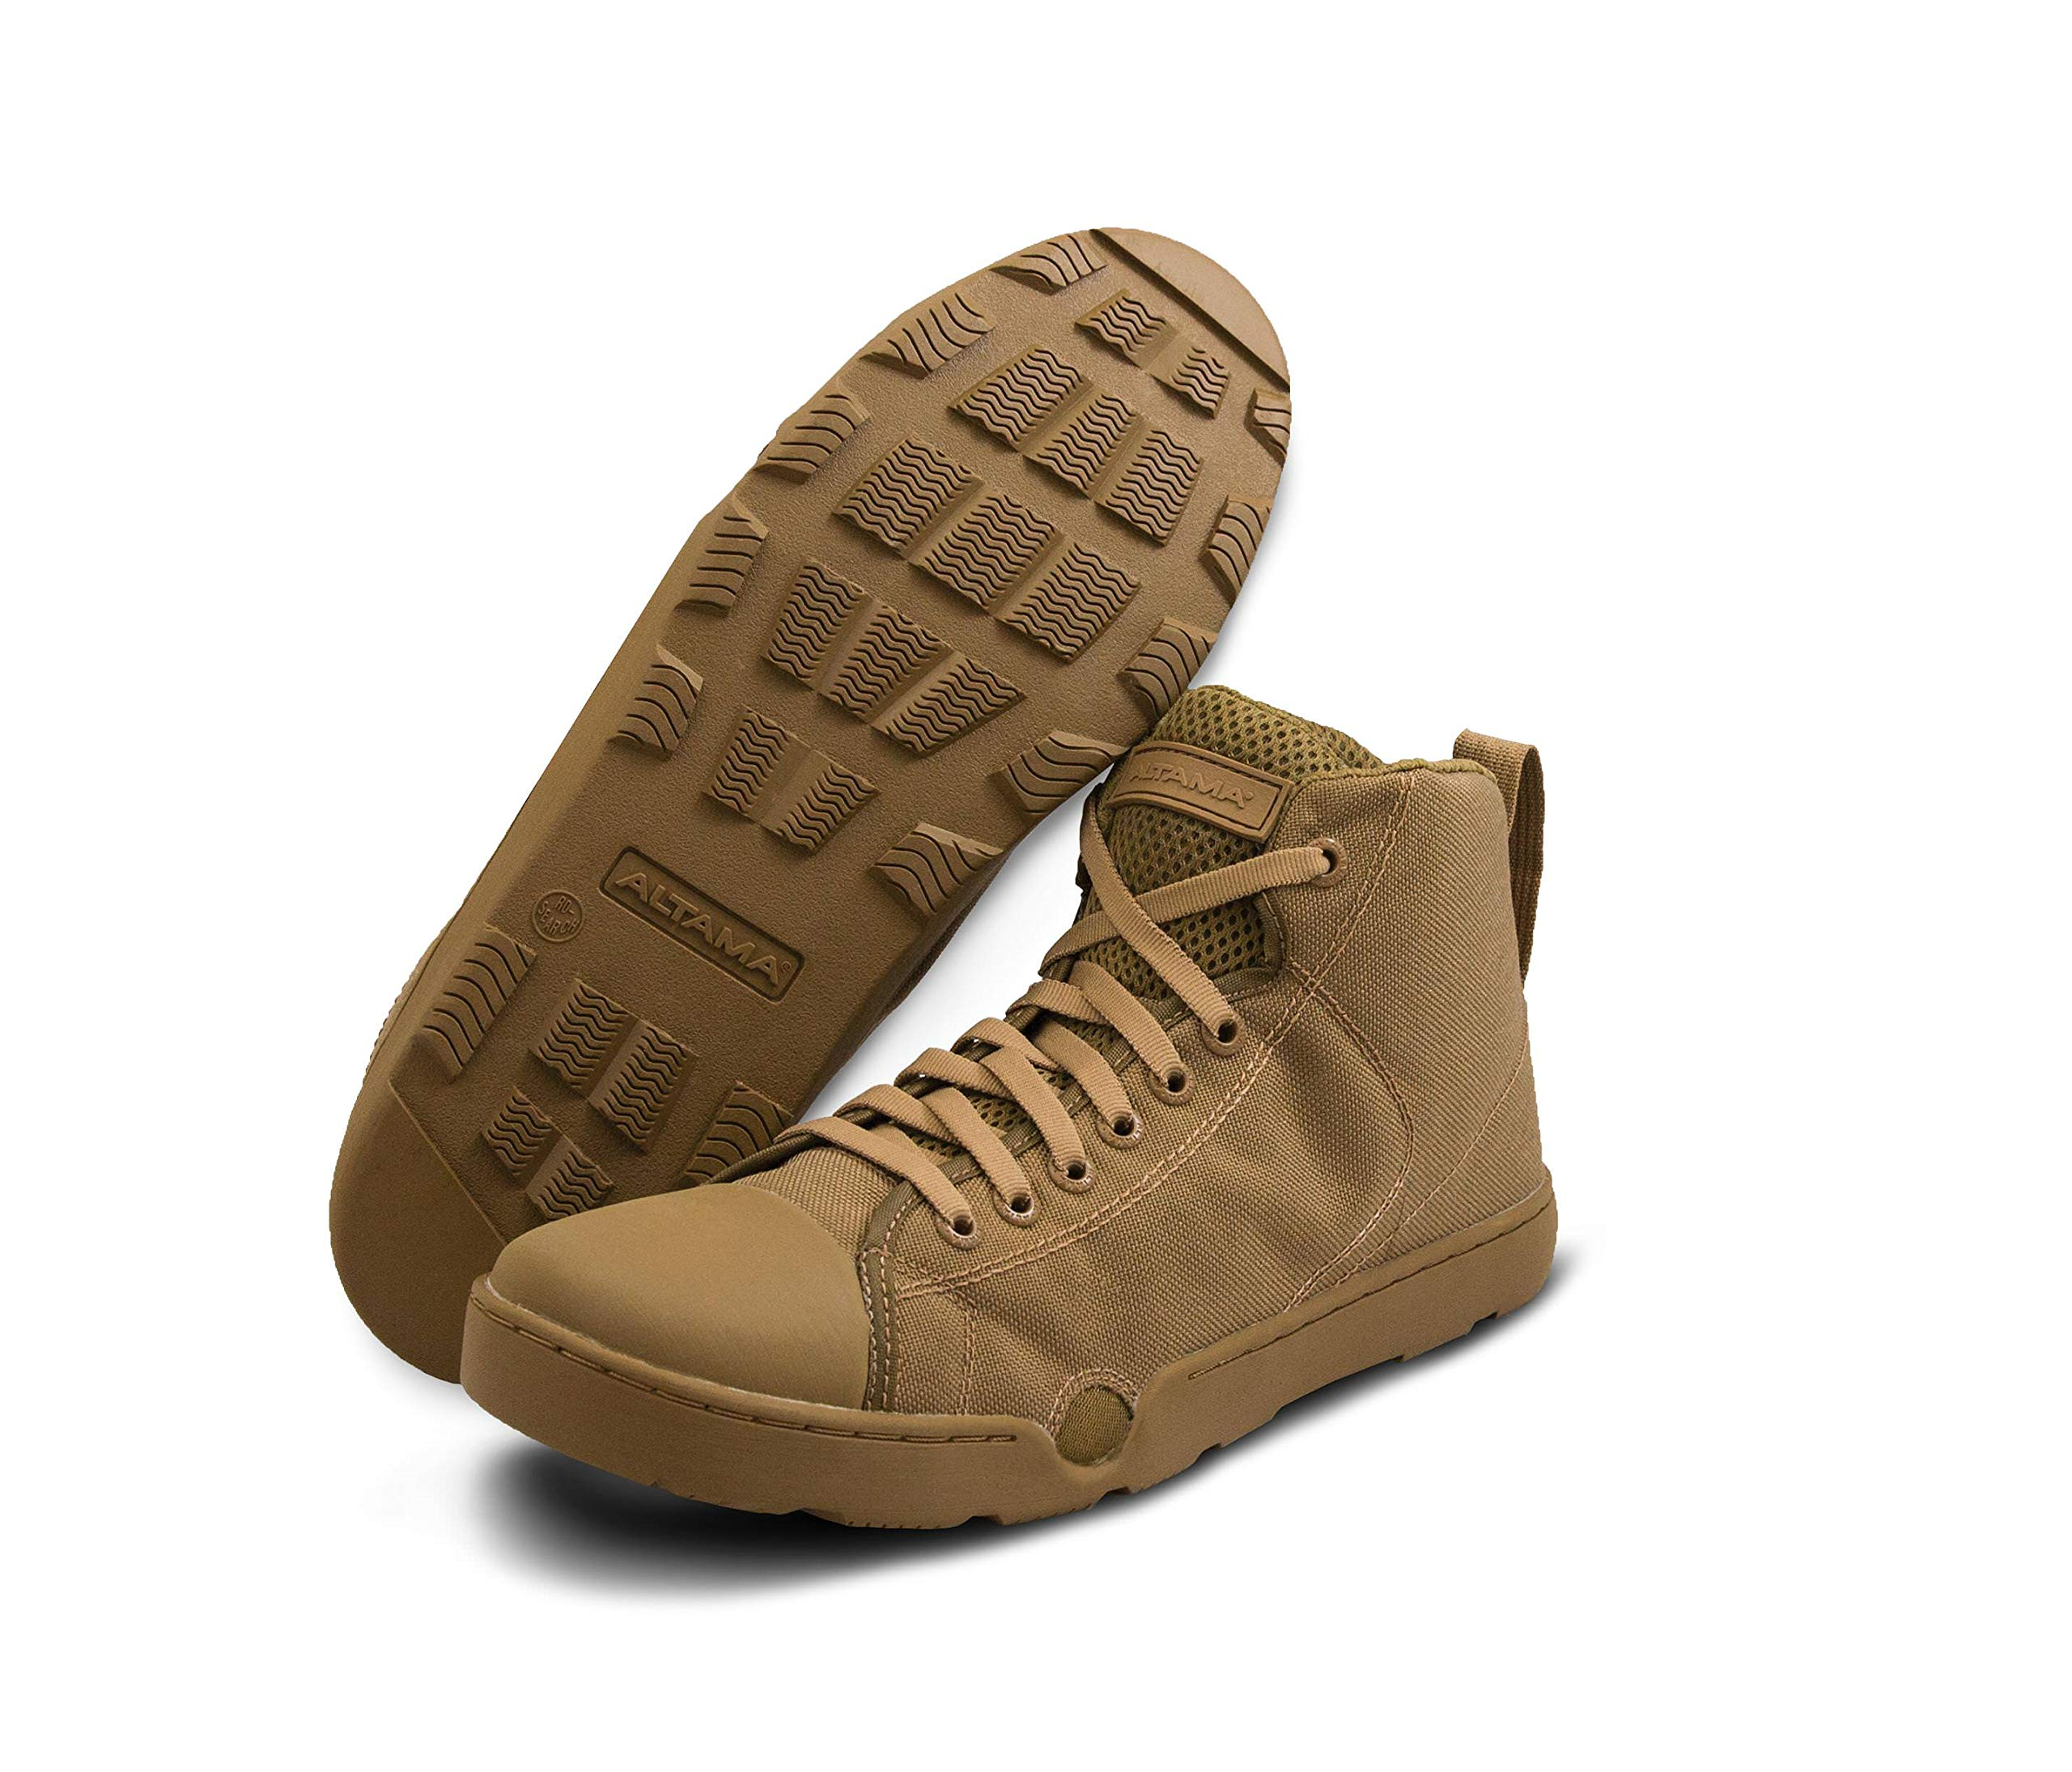 57f15ad34de Altama Boots 9.5 Top Deals & Lowest Price   SuperOffers.com